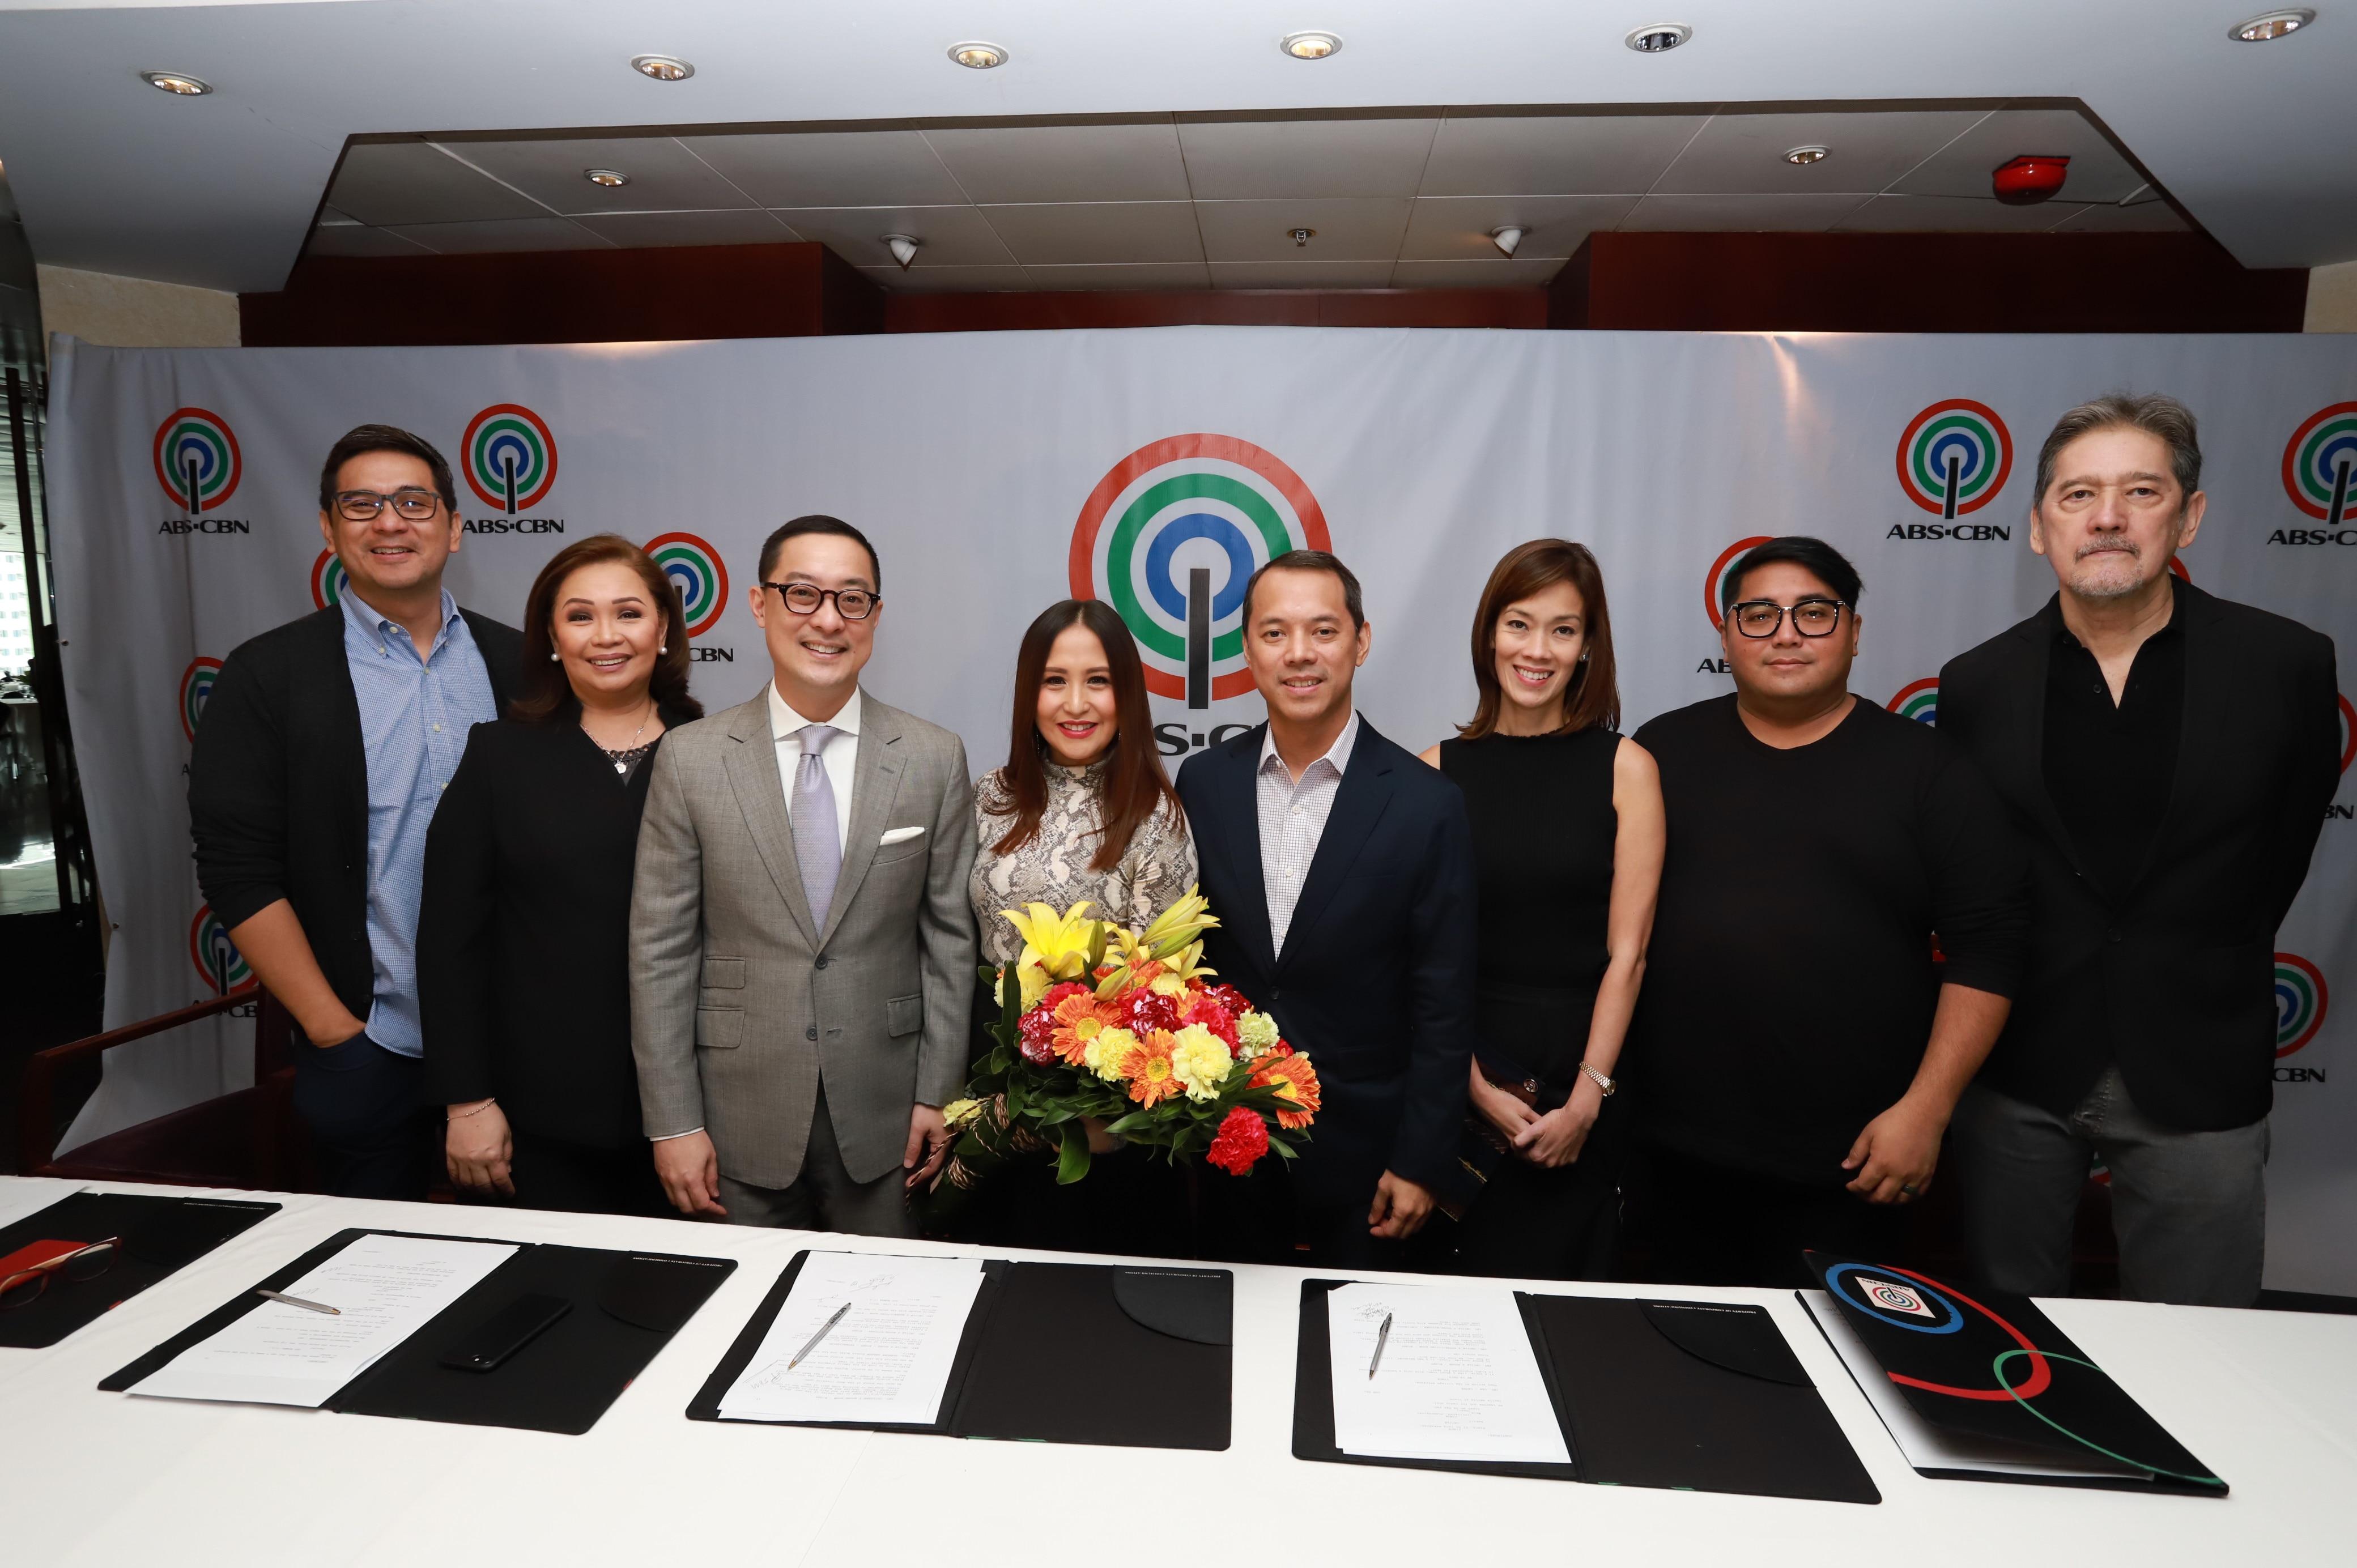 Jolina Magdangal with ABS CBN executives